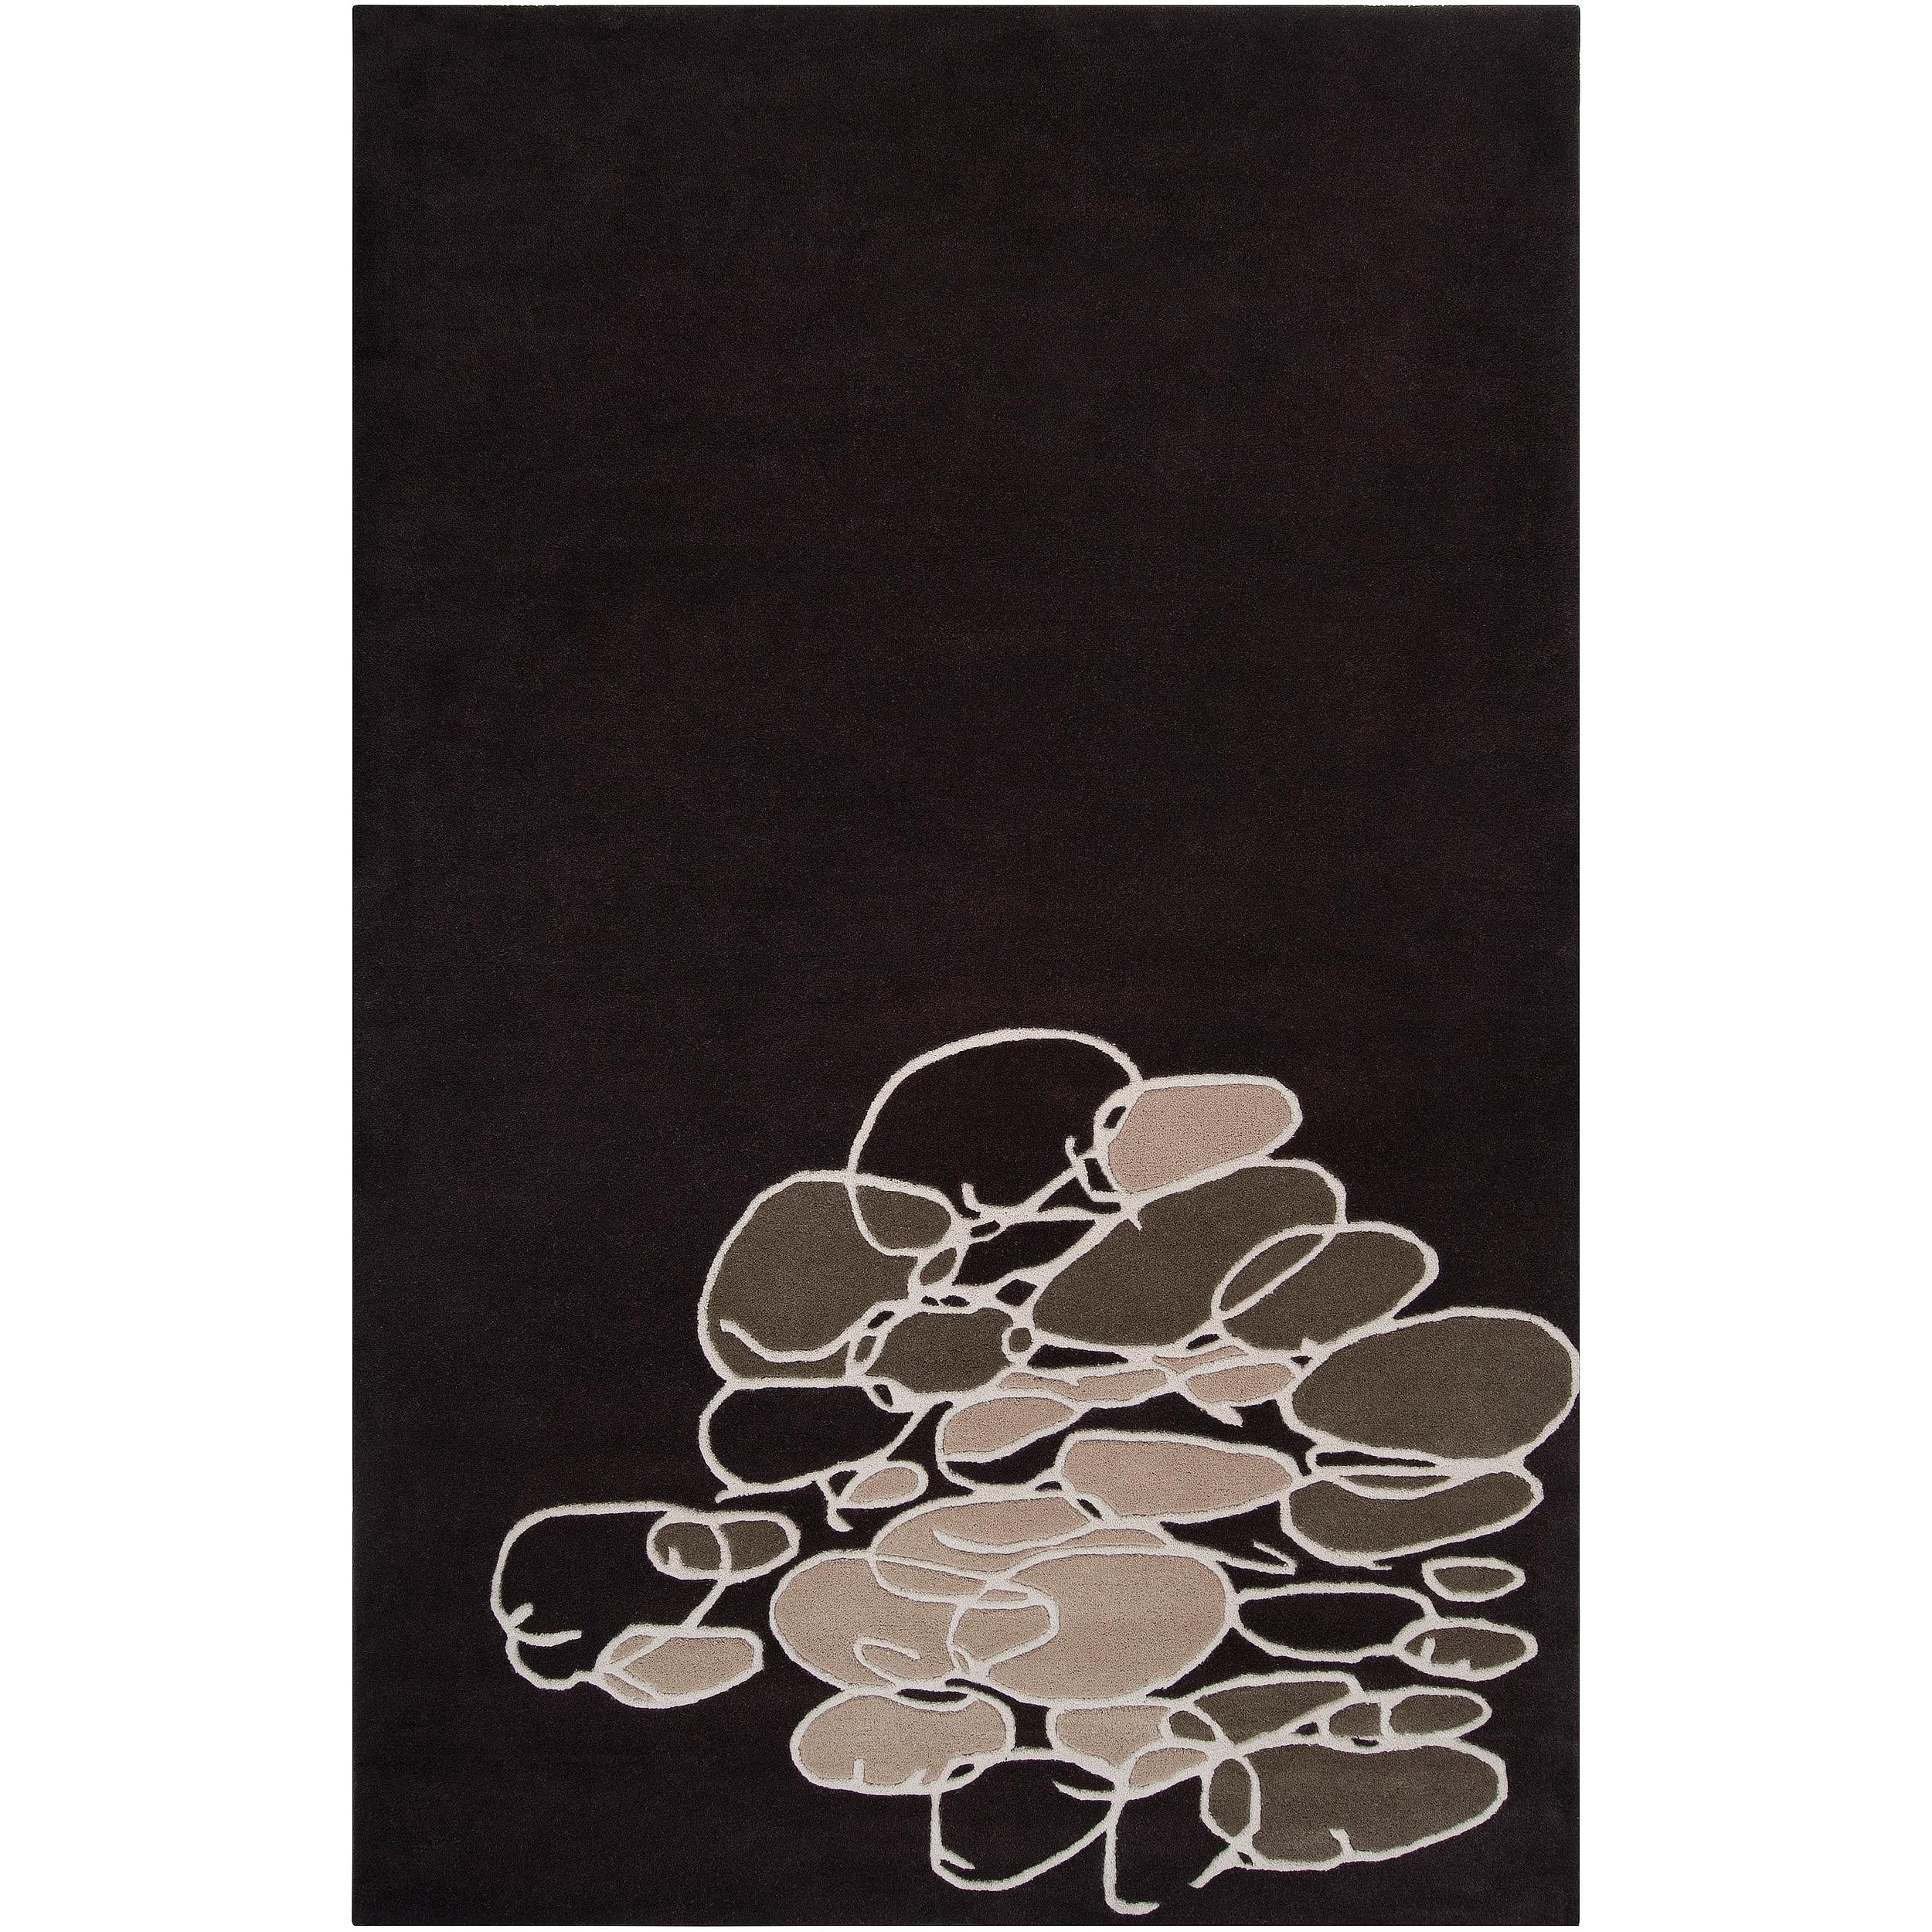 Noah Packard Hand-tufted Black/Tan Contemporary Harmony New Zealand Wool Abstract Rug (5' x 8')